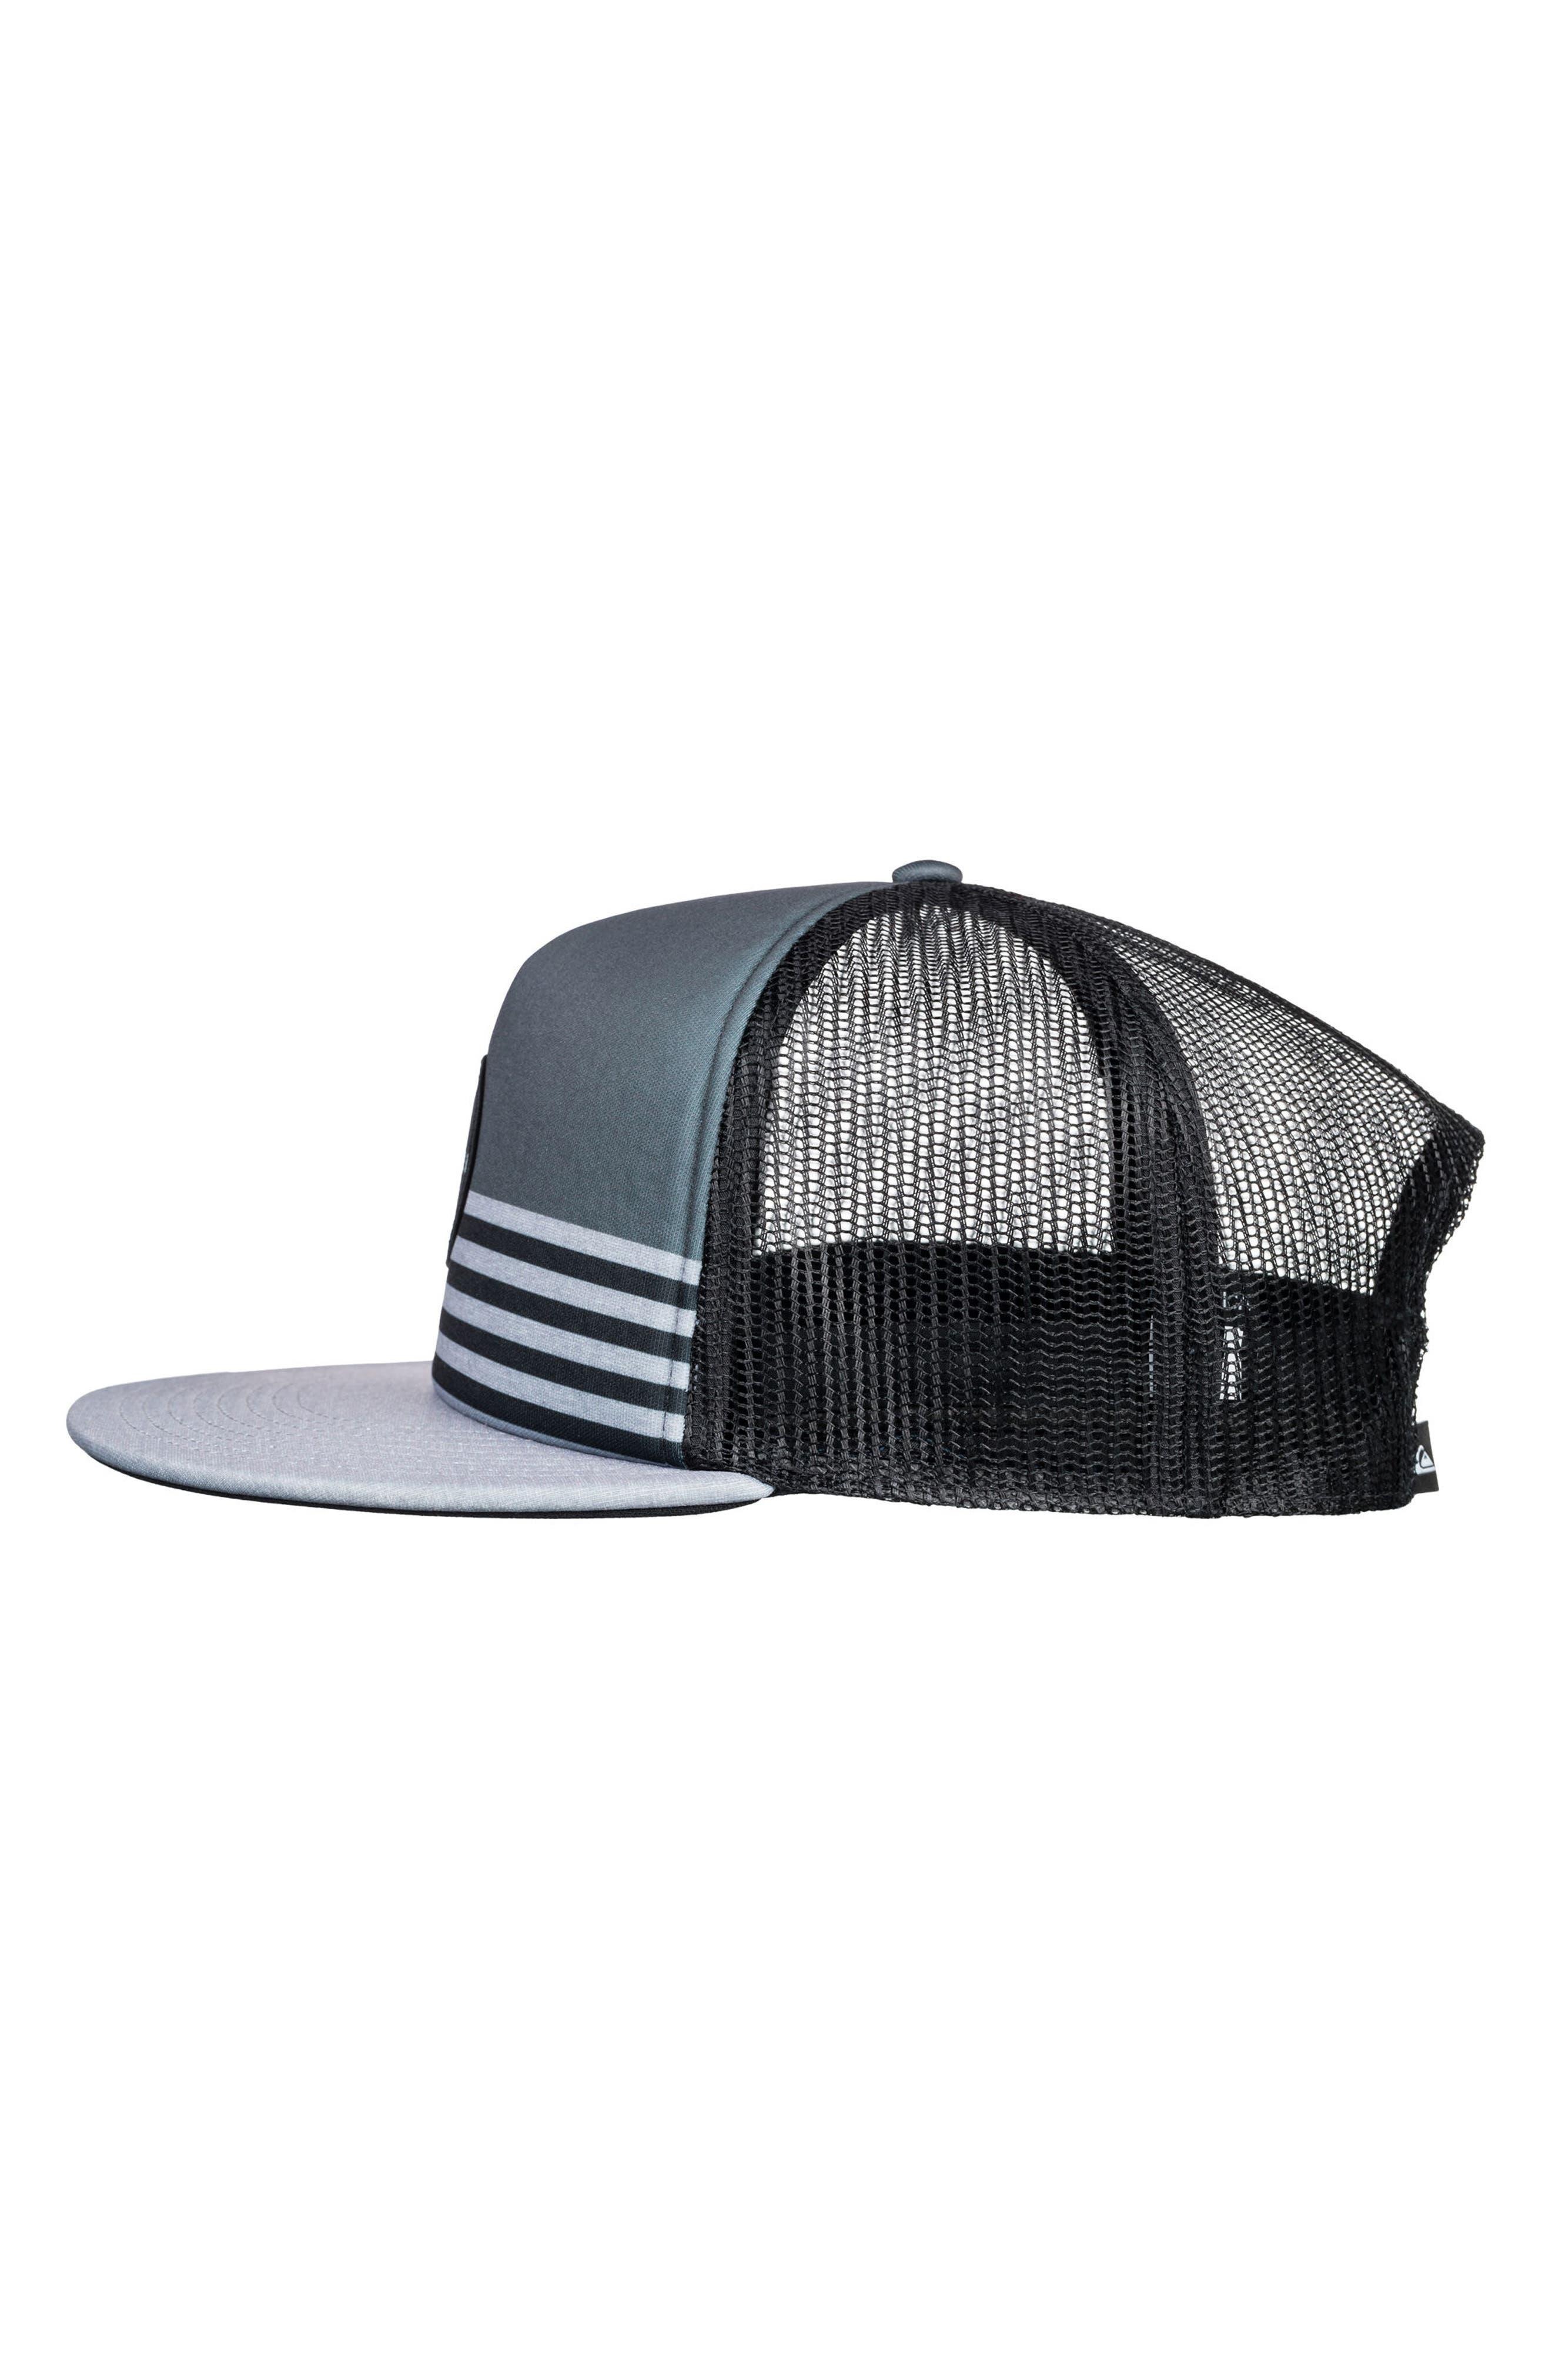 Vixten Trucker Hat,                             Alternate thumbnail 4, color,                             022